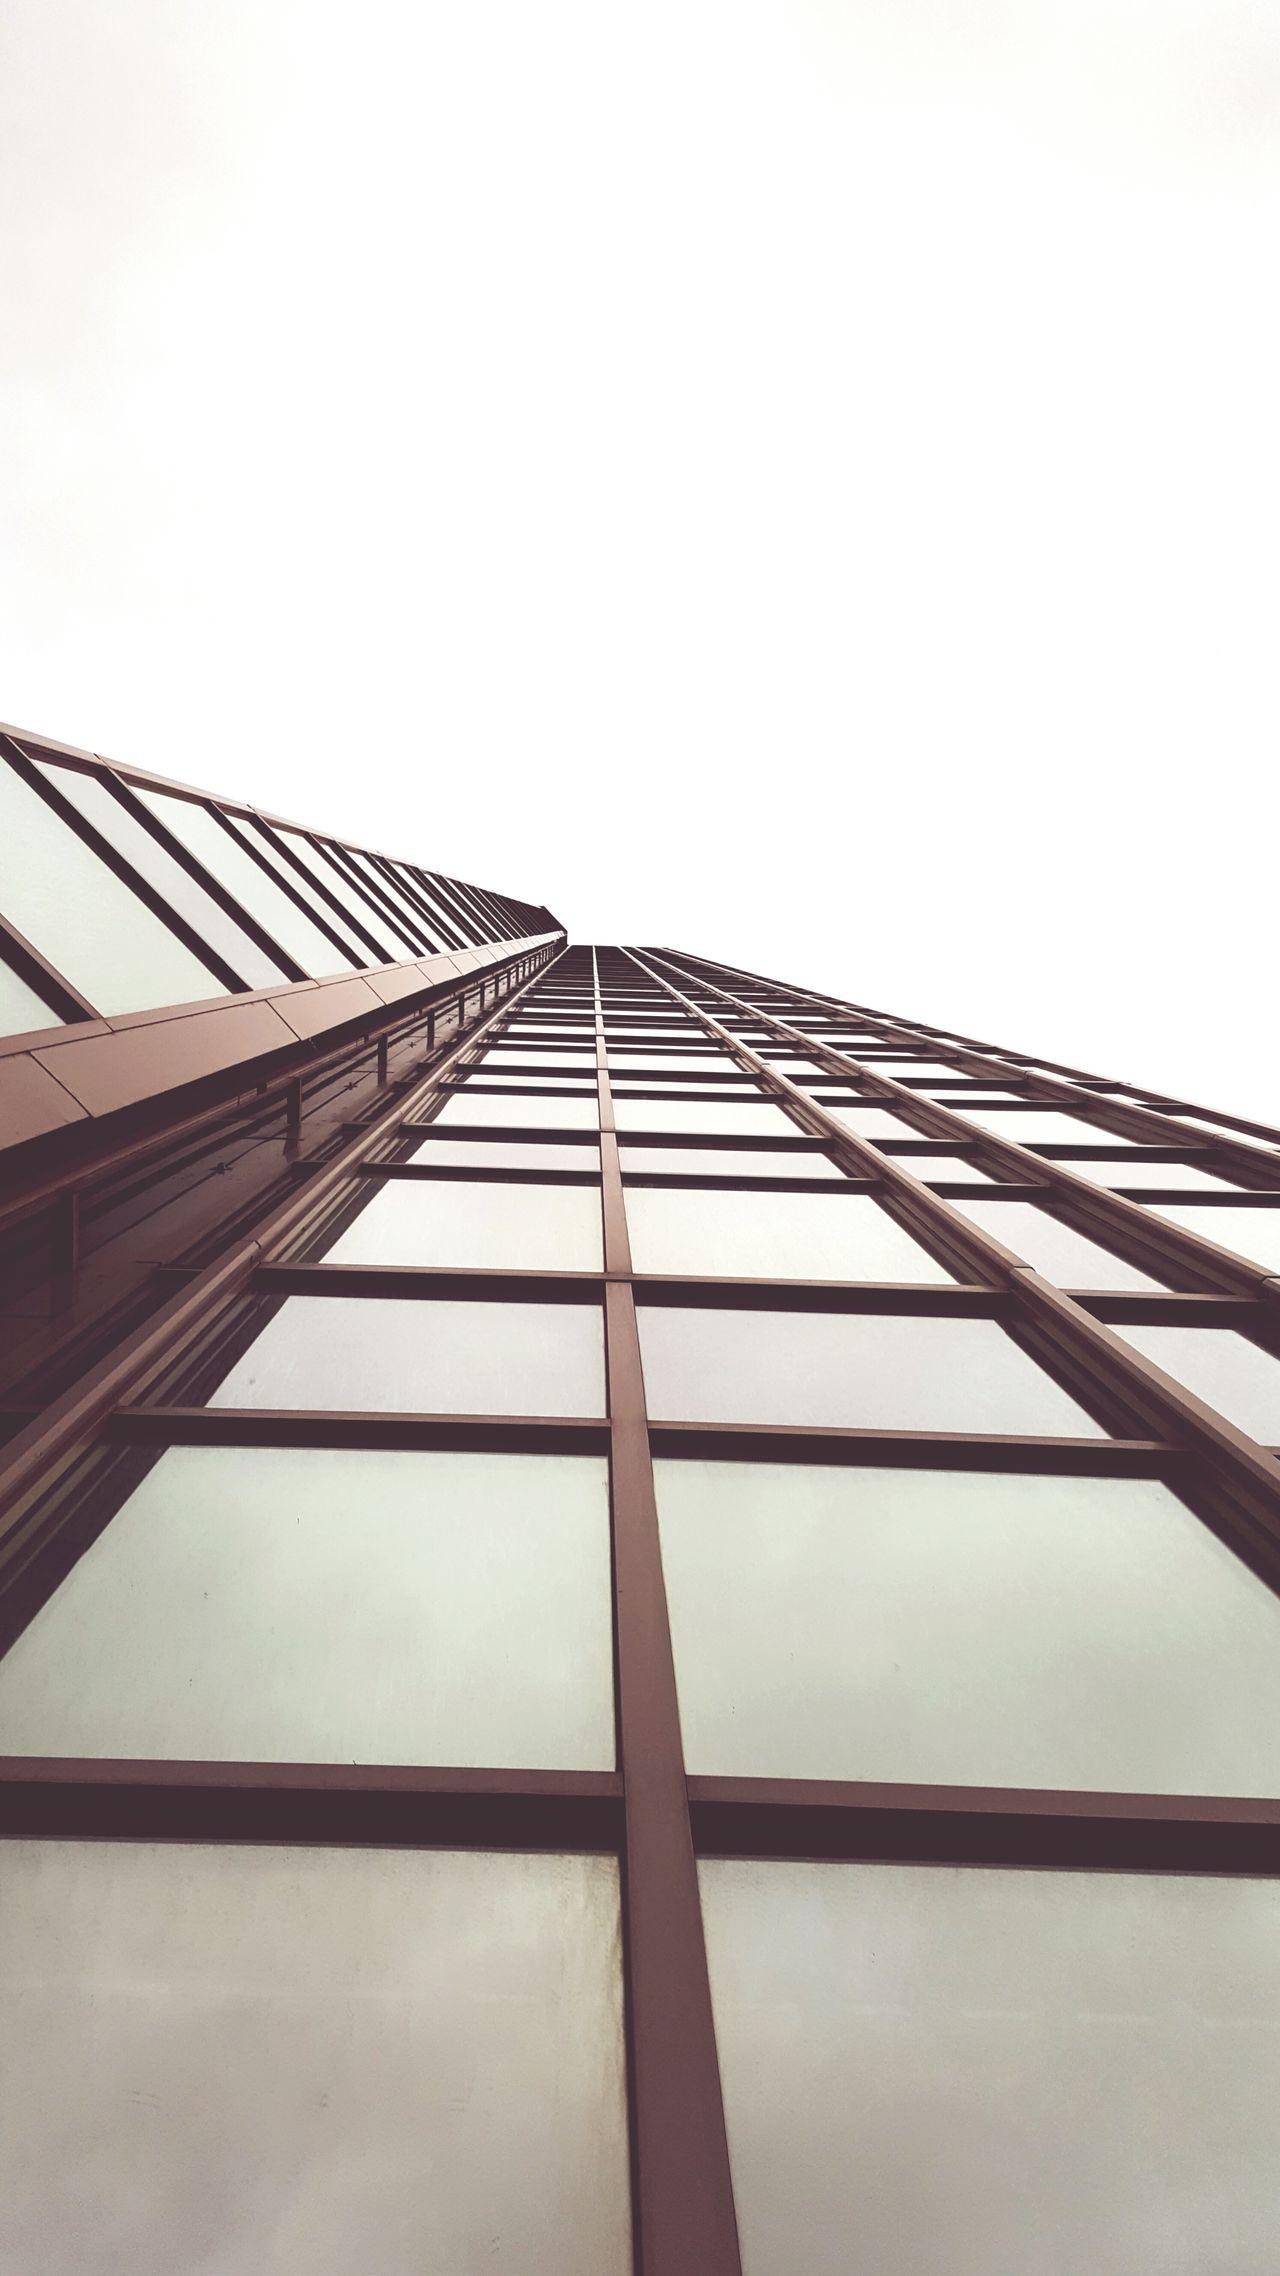 Thearchitect-2016-eyeemawards Architecture Arcitecturephotography Architectural Detail Architecturelovers